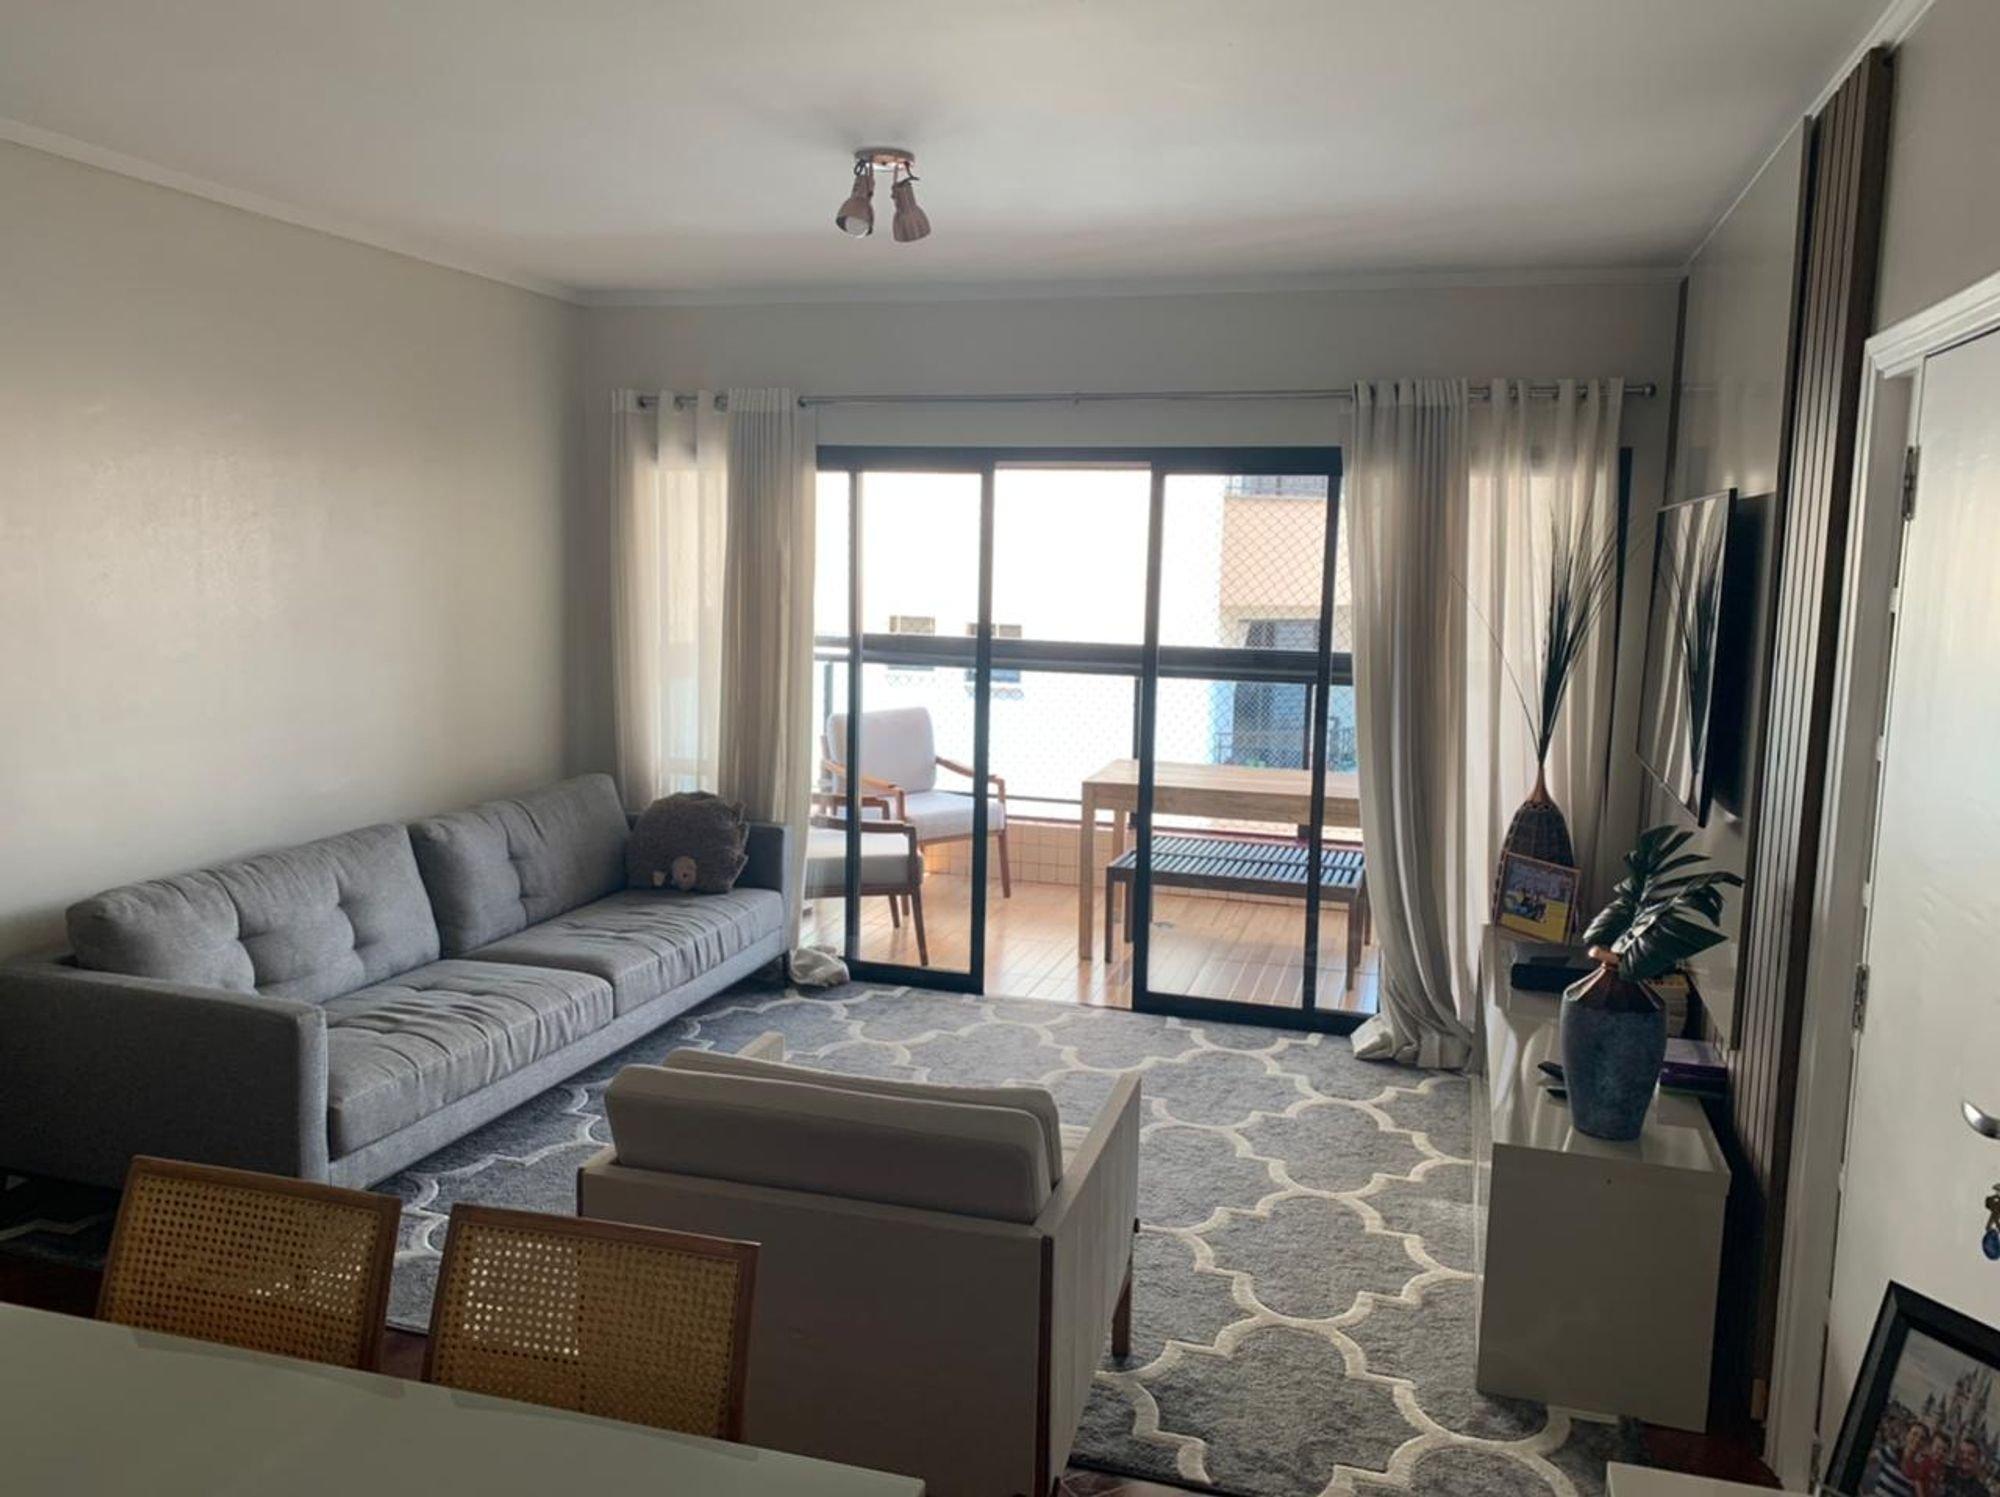 Foto de Sala com cama, vaso de planta, sofá, vaso, cadeira, mesa de jantar